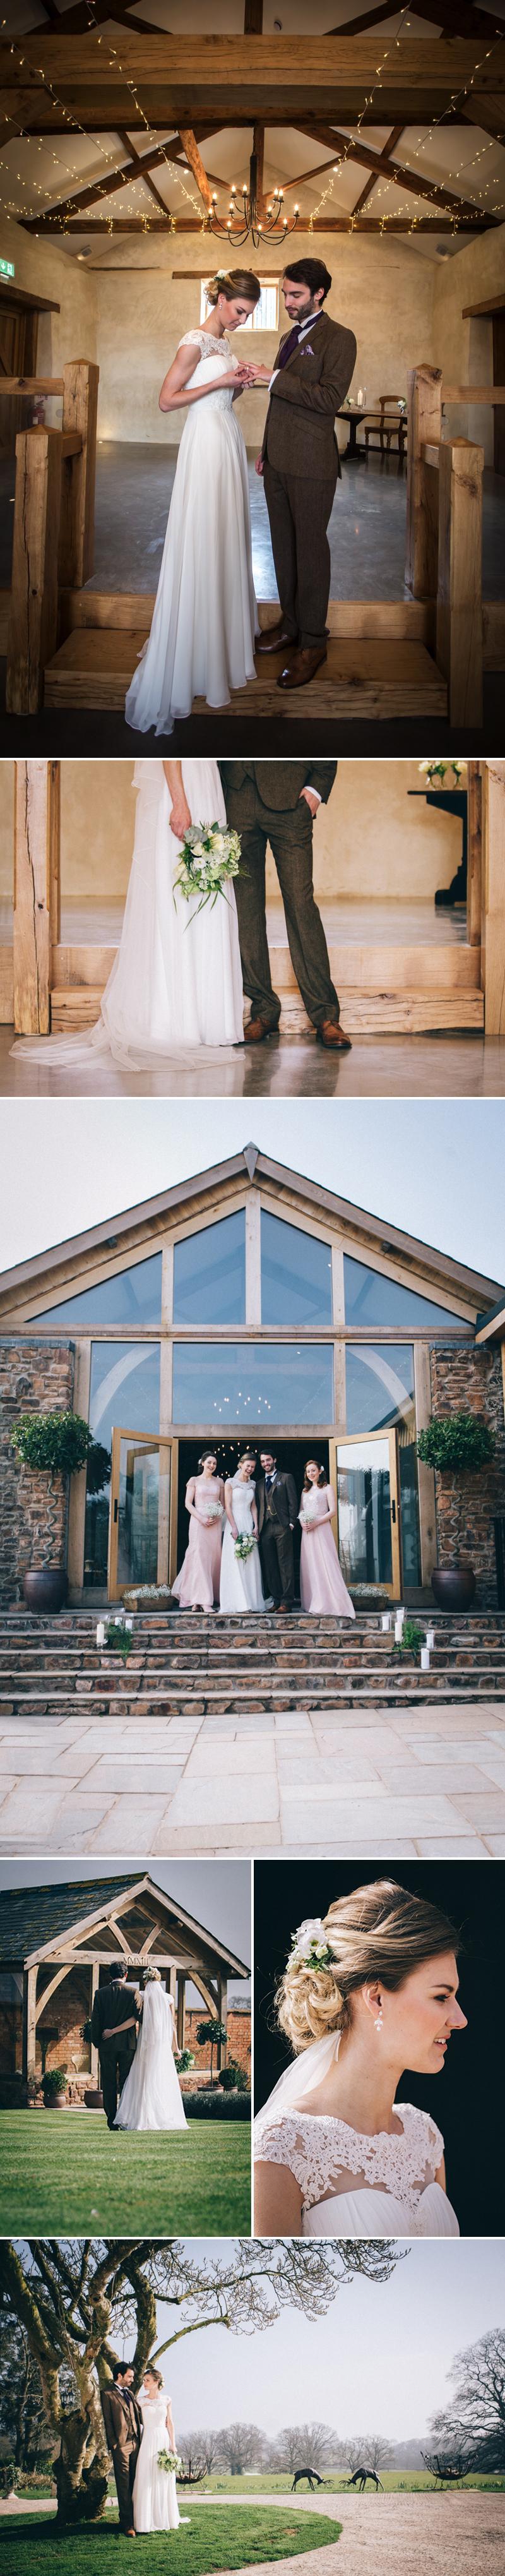 wedding-venues-in-devon-uk-wedding-venue-directory-upton-barn-and-walled-garden-rustic-inspired-styled-shoot-coco-wedding-venues-003